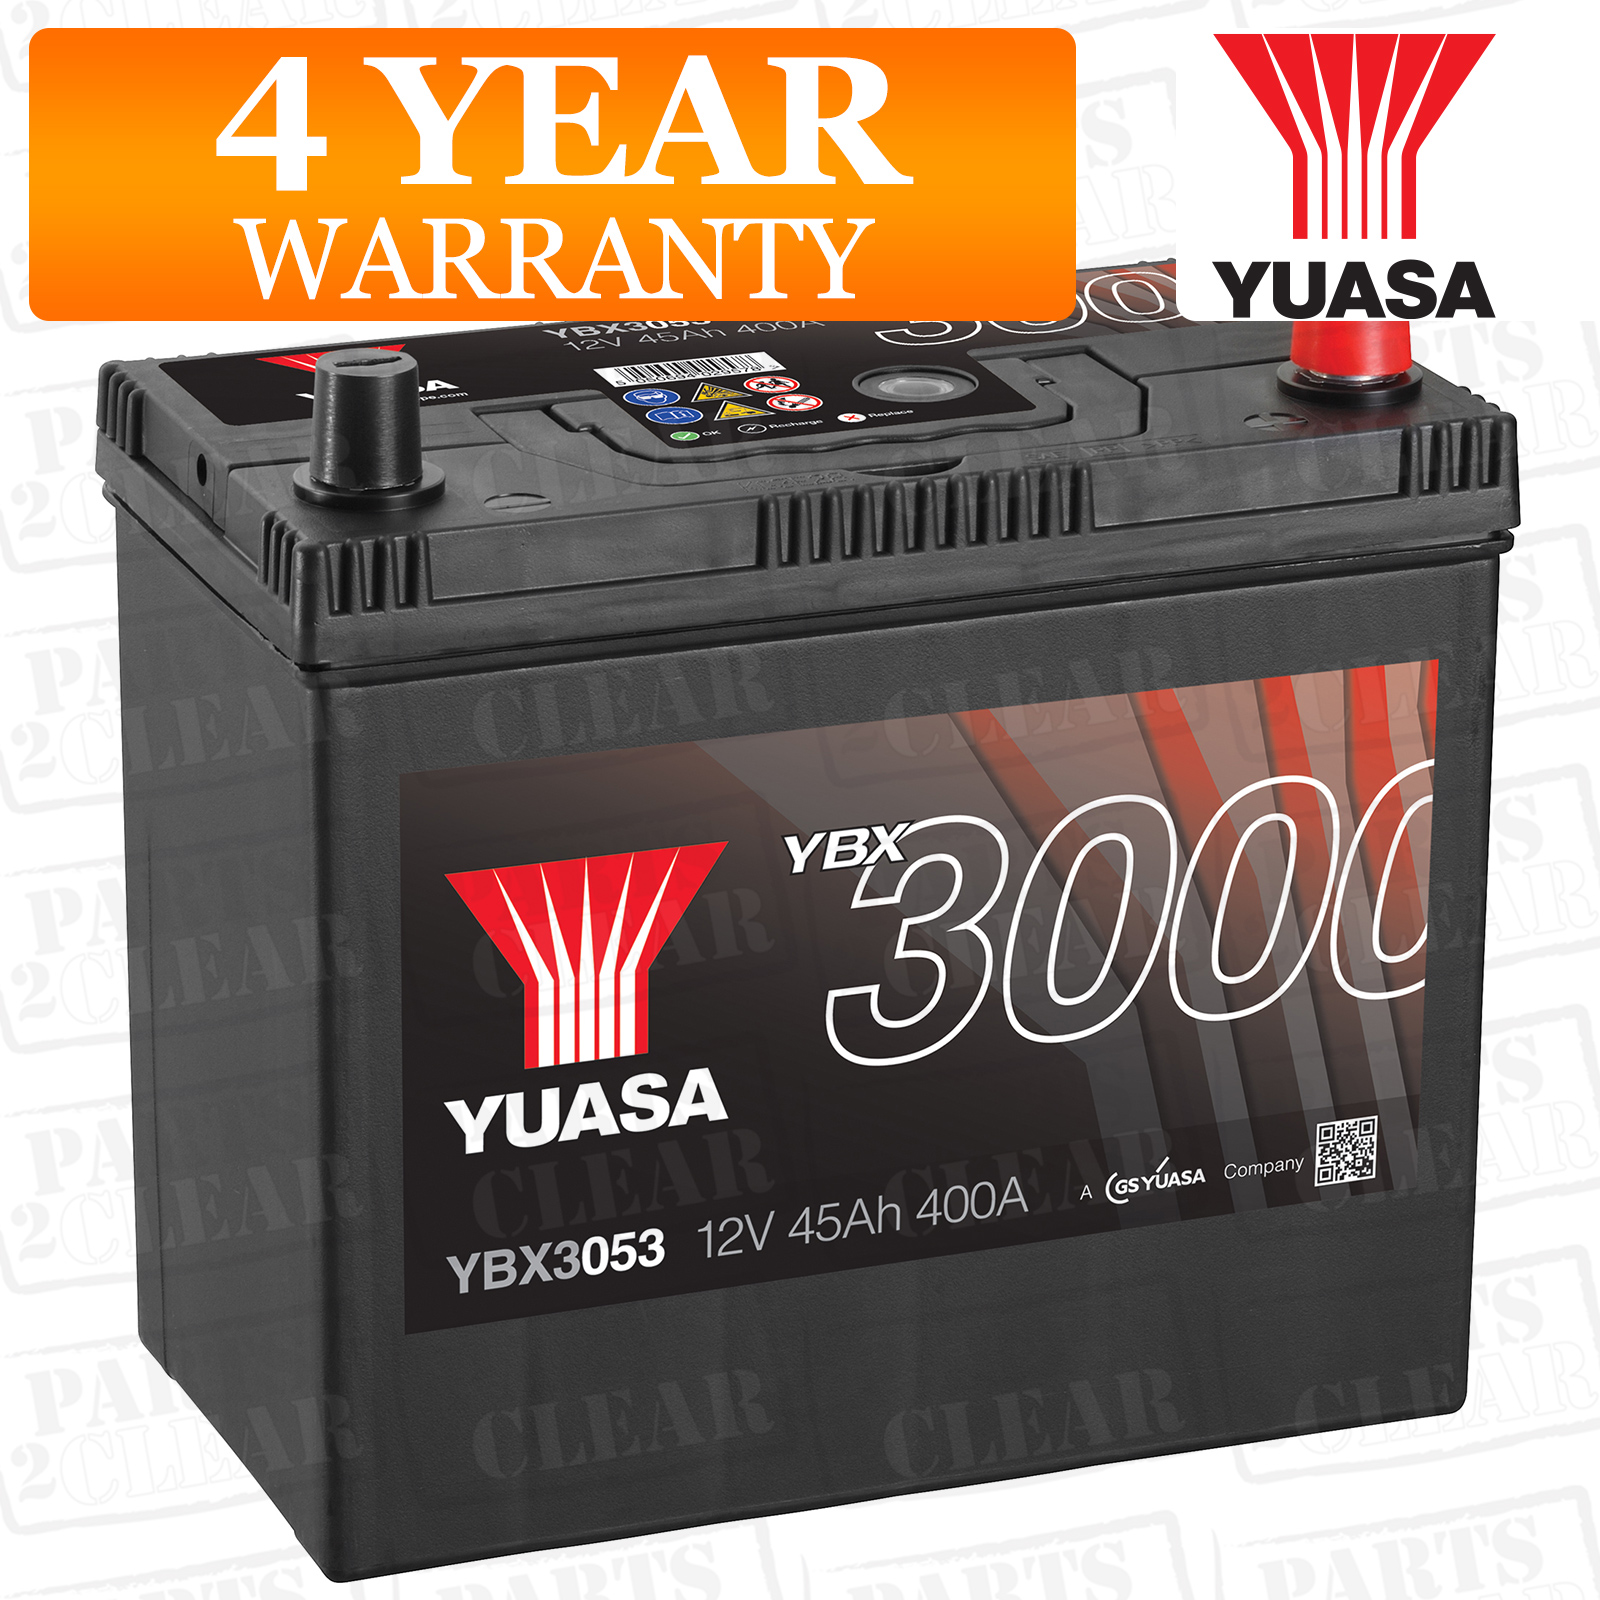 Yuasa Car Battery Calcium Black Case 12v 400cca 45ah T1 T3 For Timing Belt Suzuki Liana 16